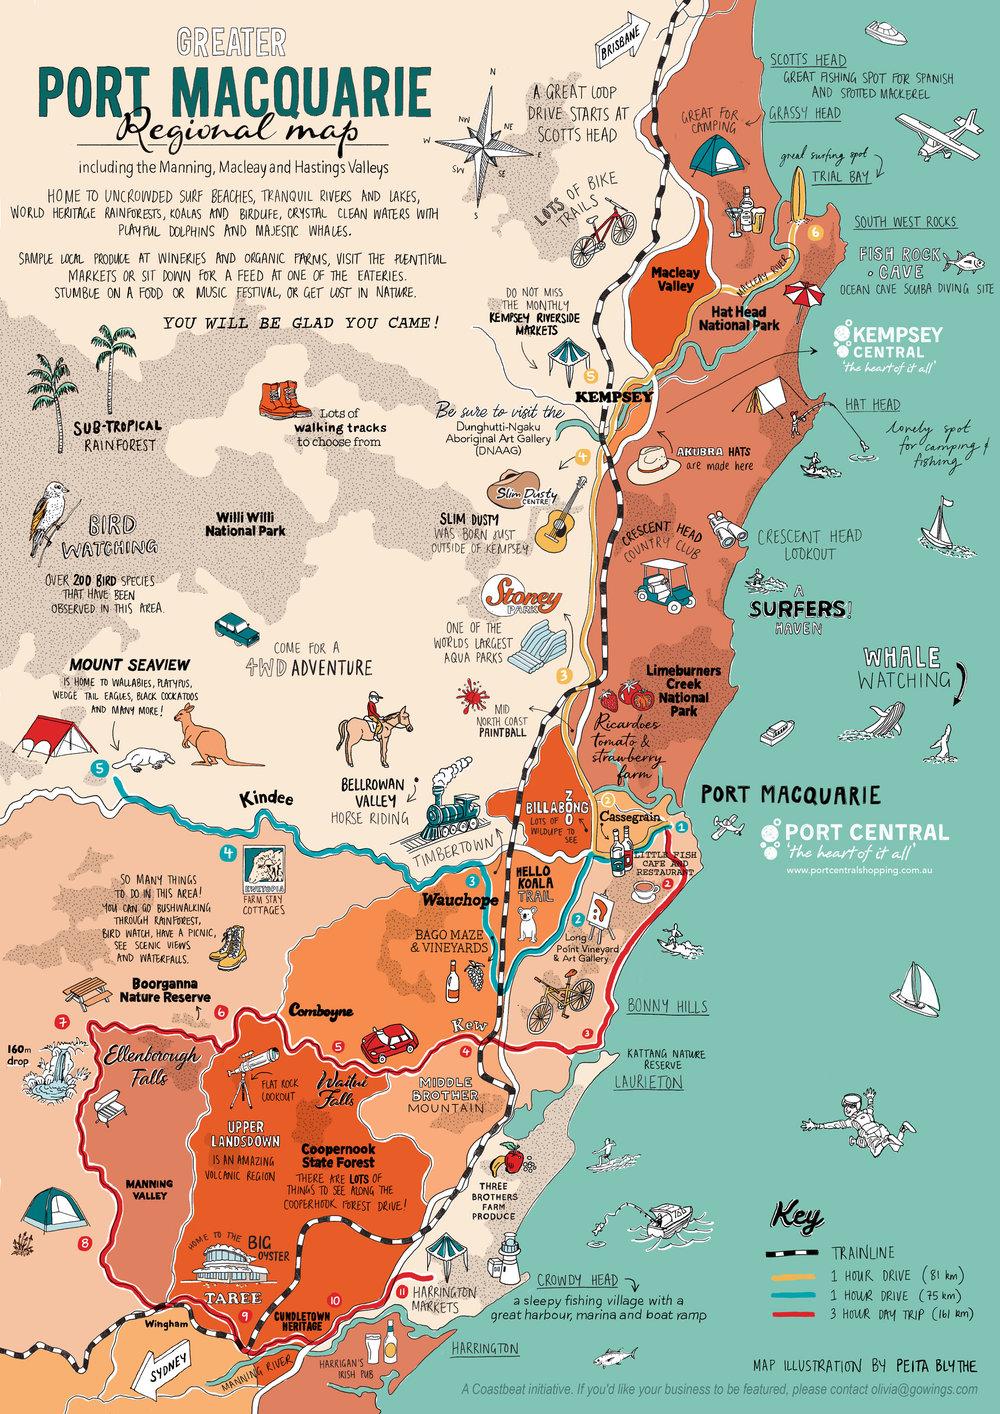 Peita-Blythe_Port-Macquarie-Regional-Map_Web.jpg